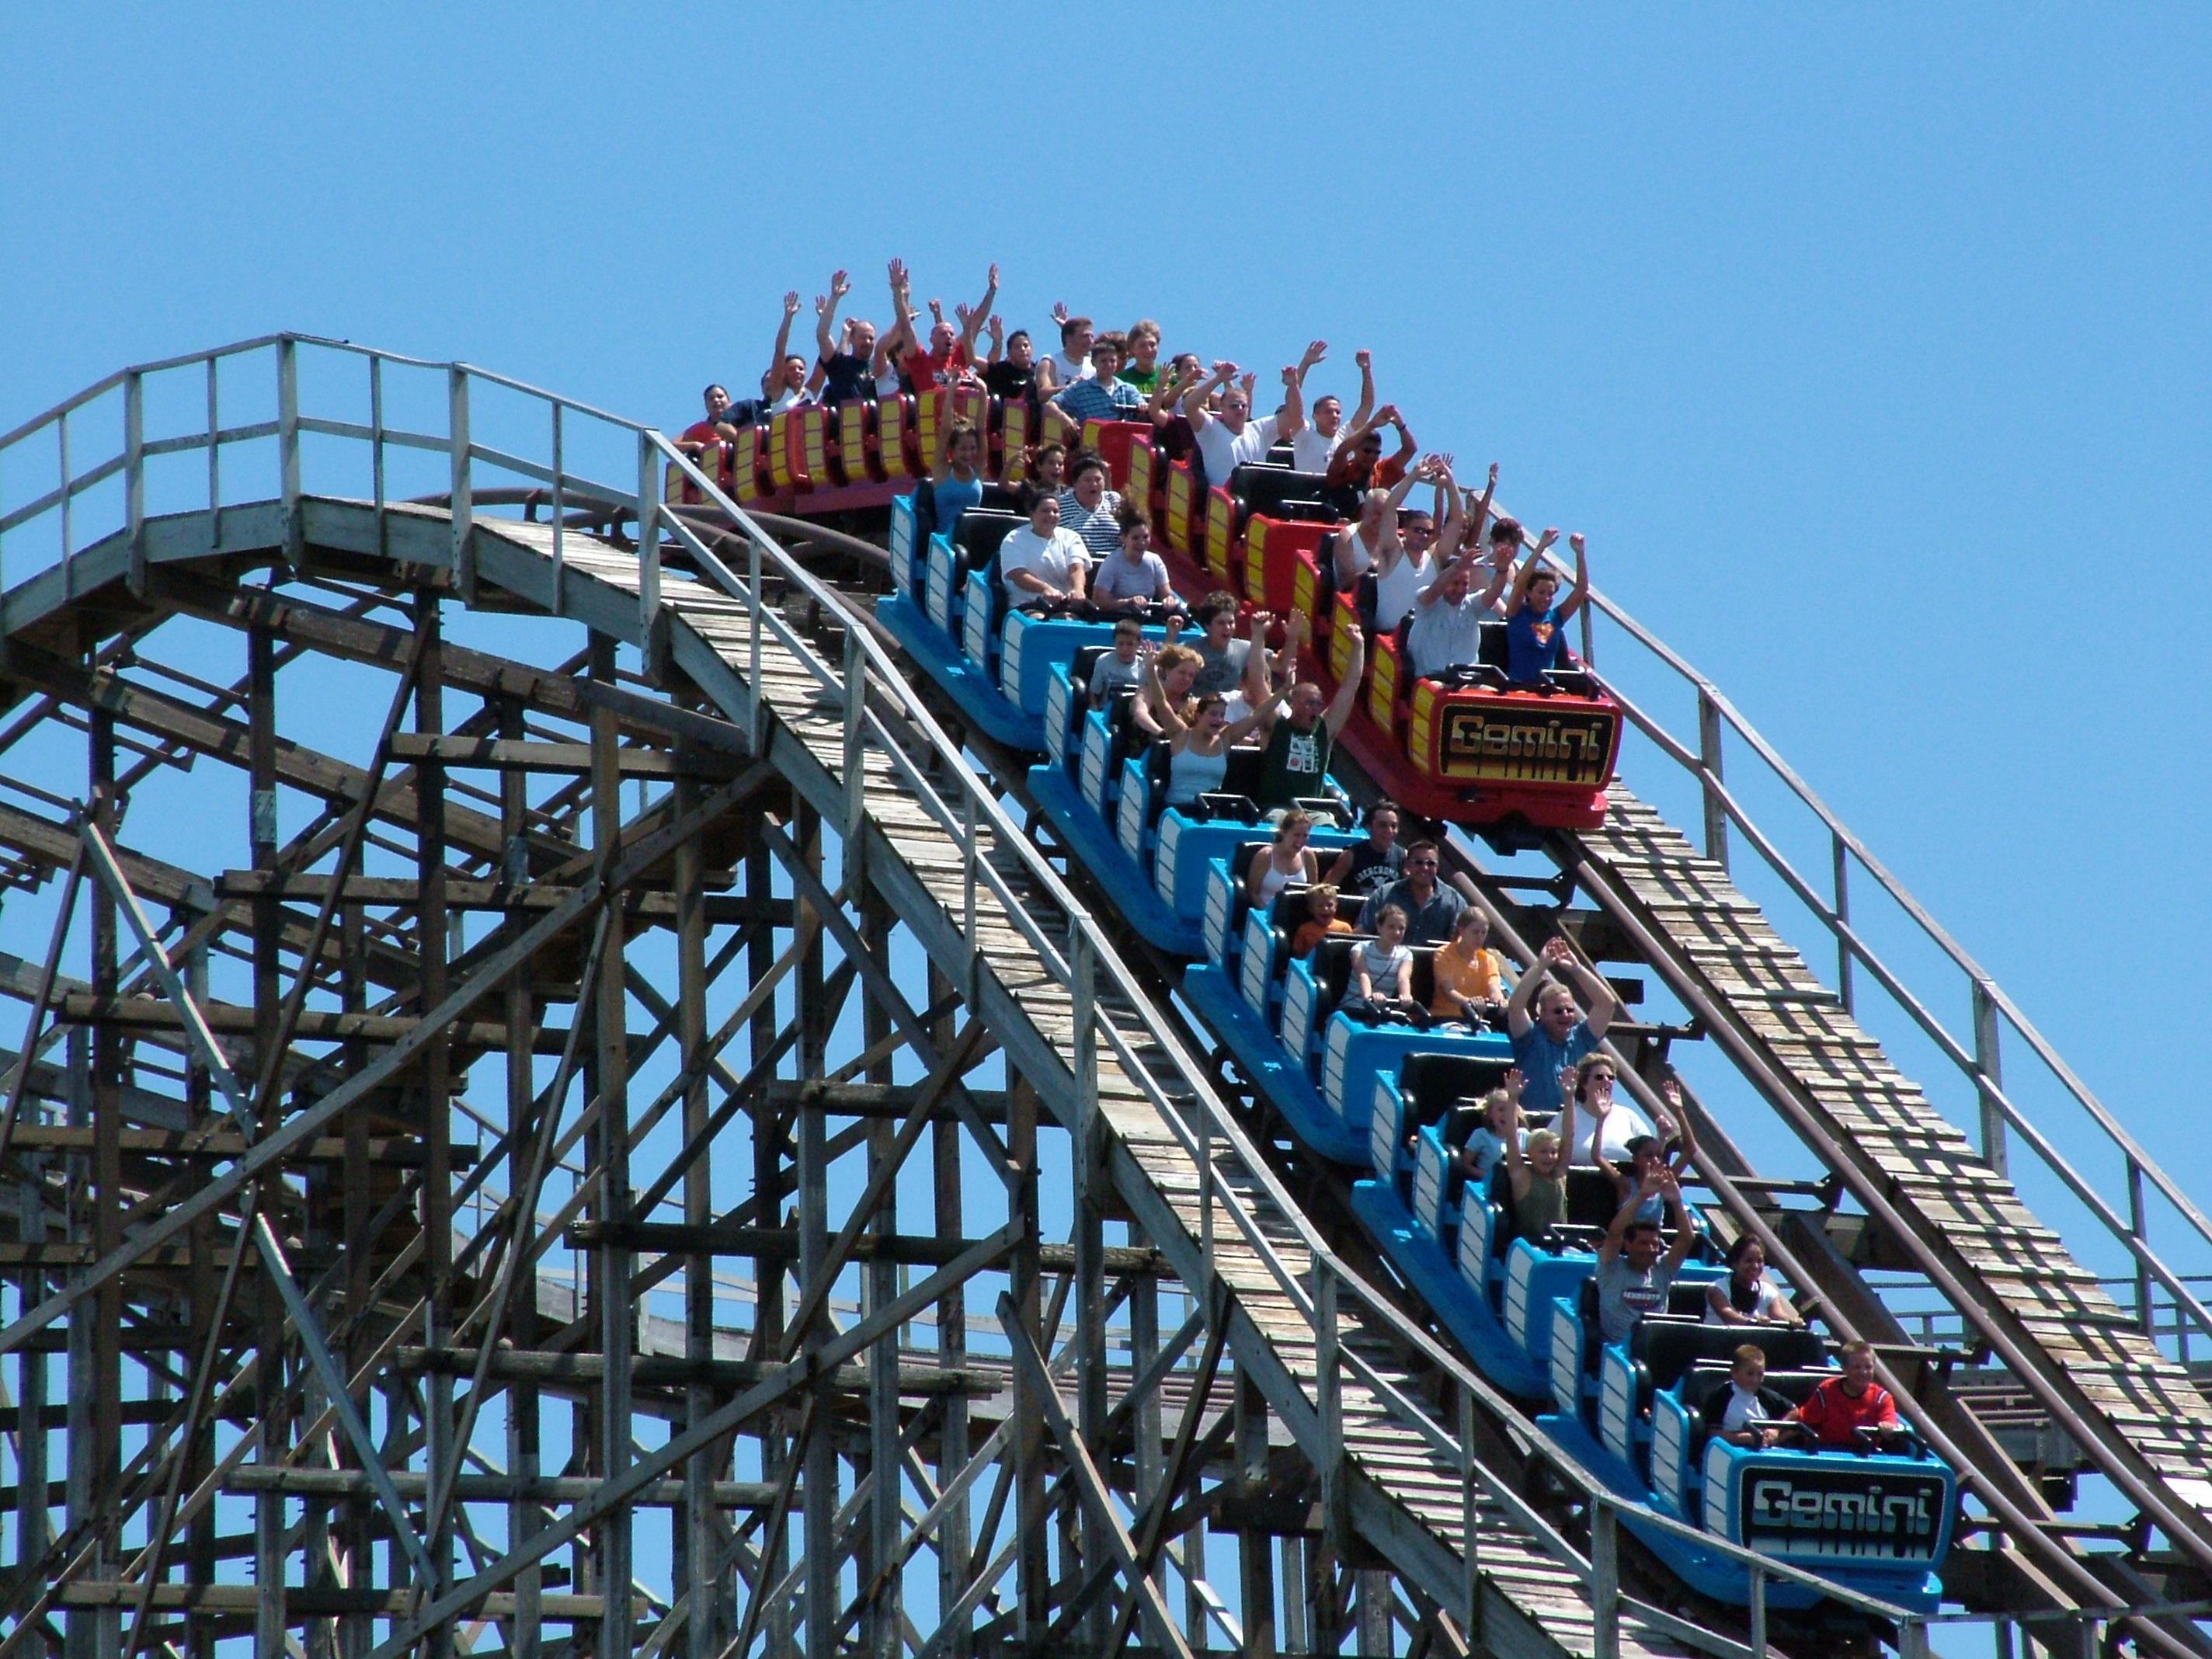 Gemini Roller Coaster Wikipedia